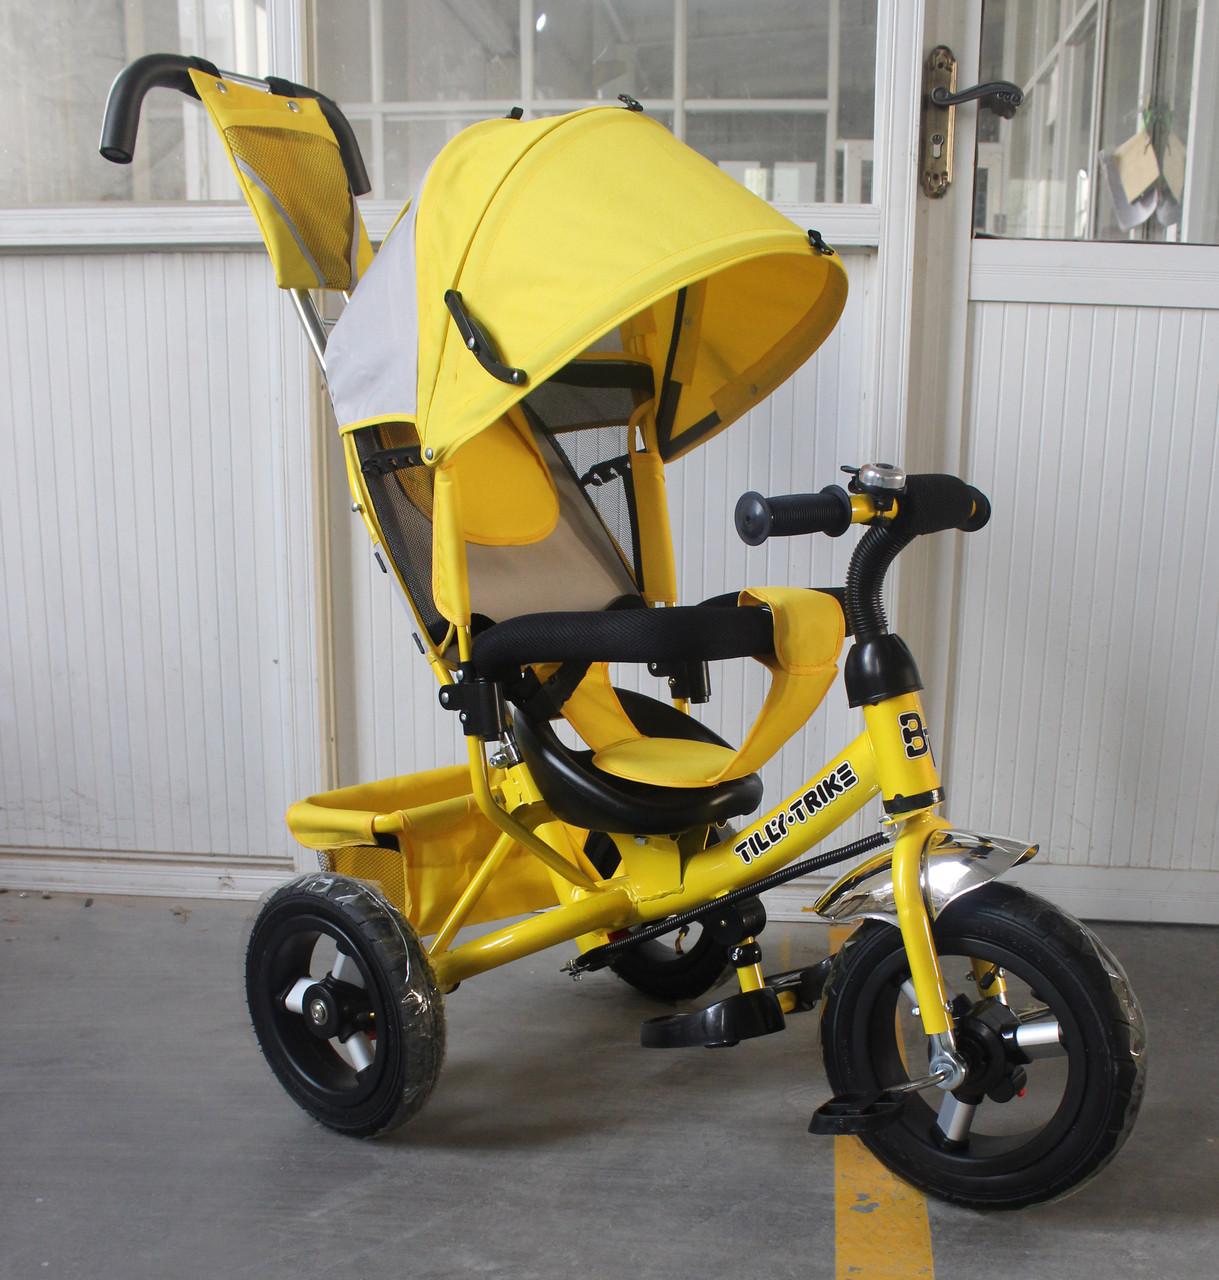 Велосипед трехколесный TILLY Trike T-364 Ухти-Тухти Кривой Рог